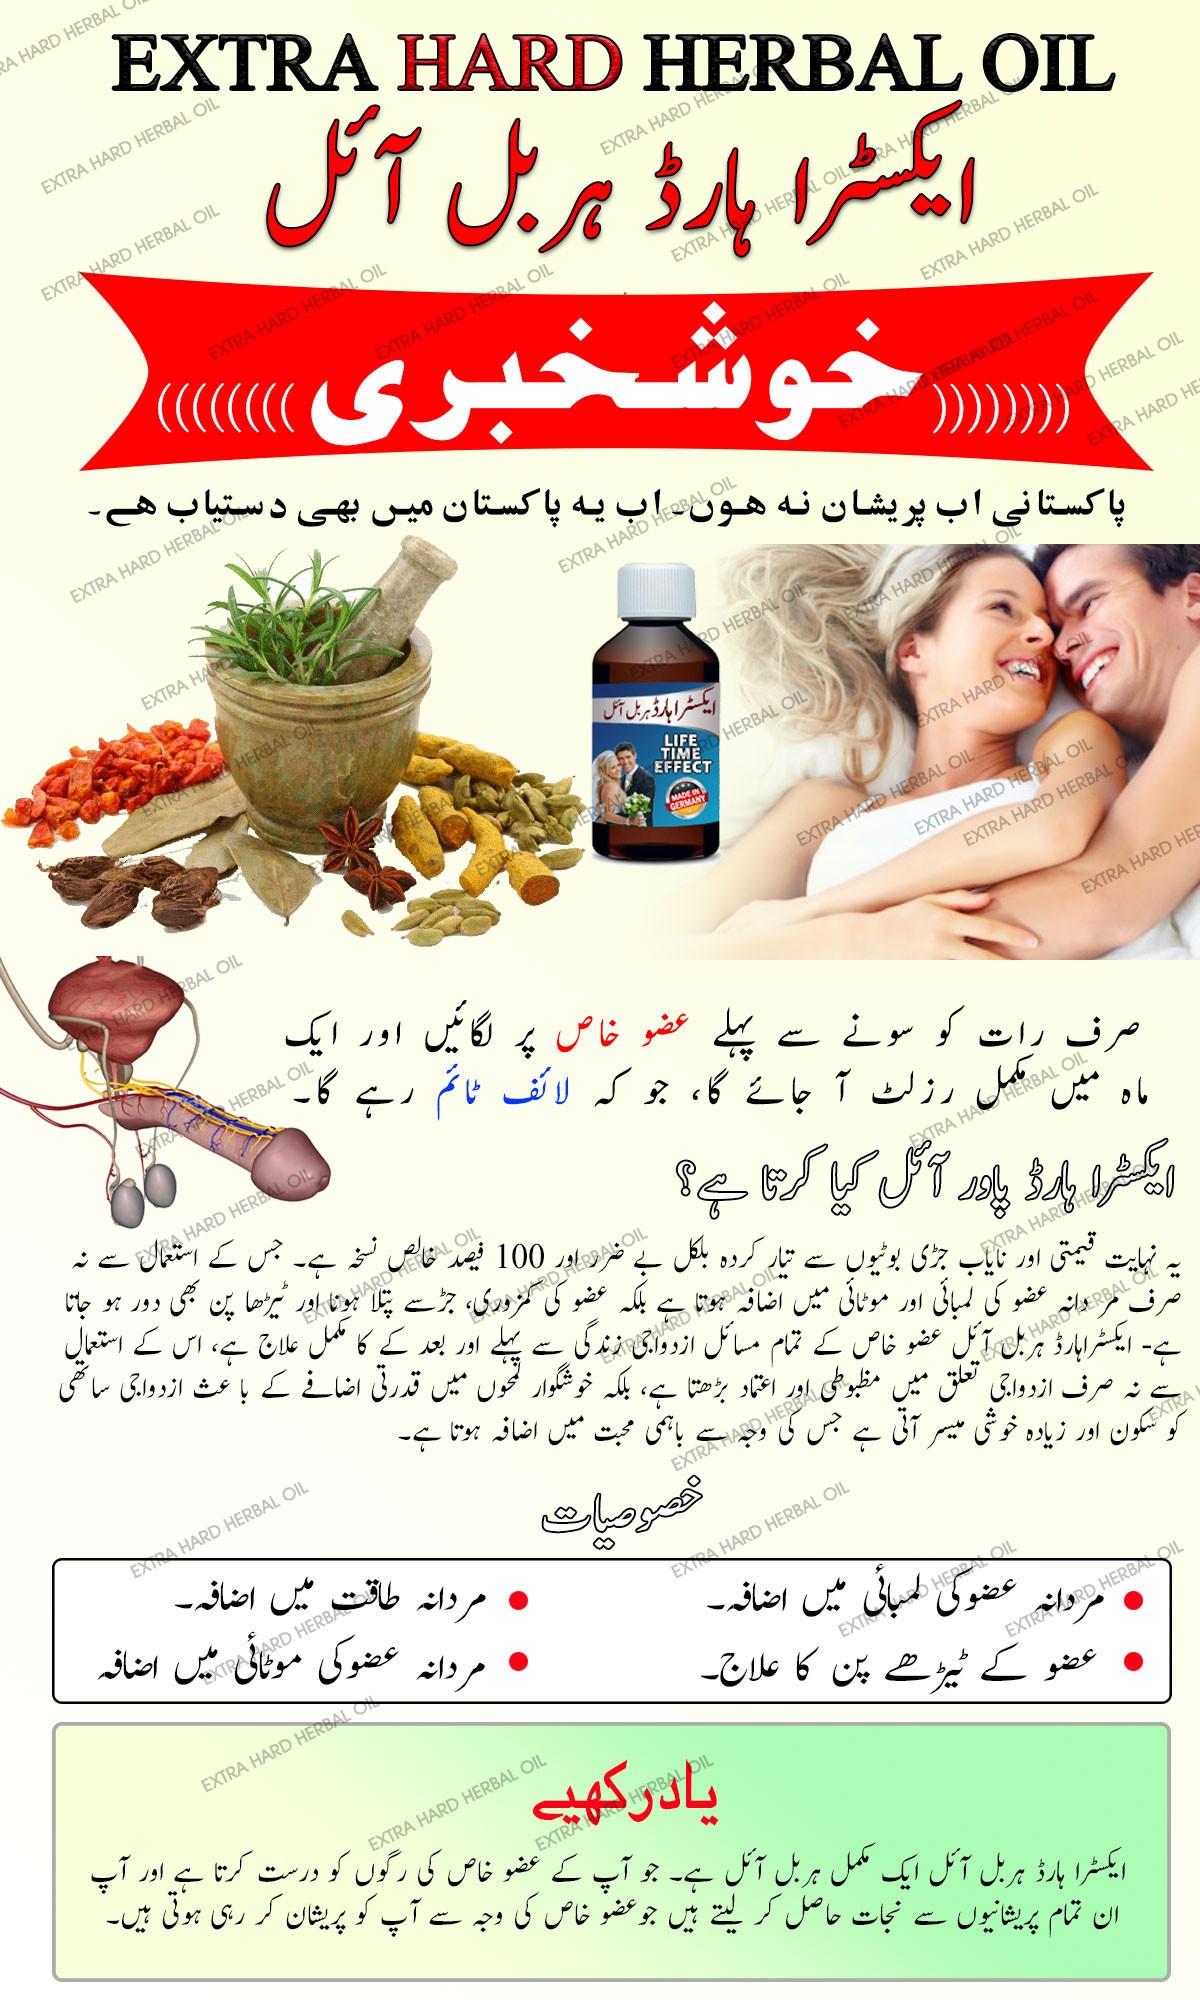 extra hard herbal oil